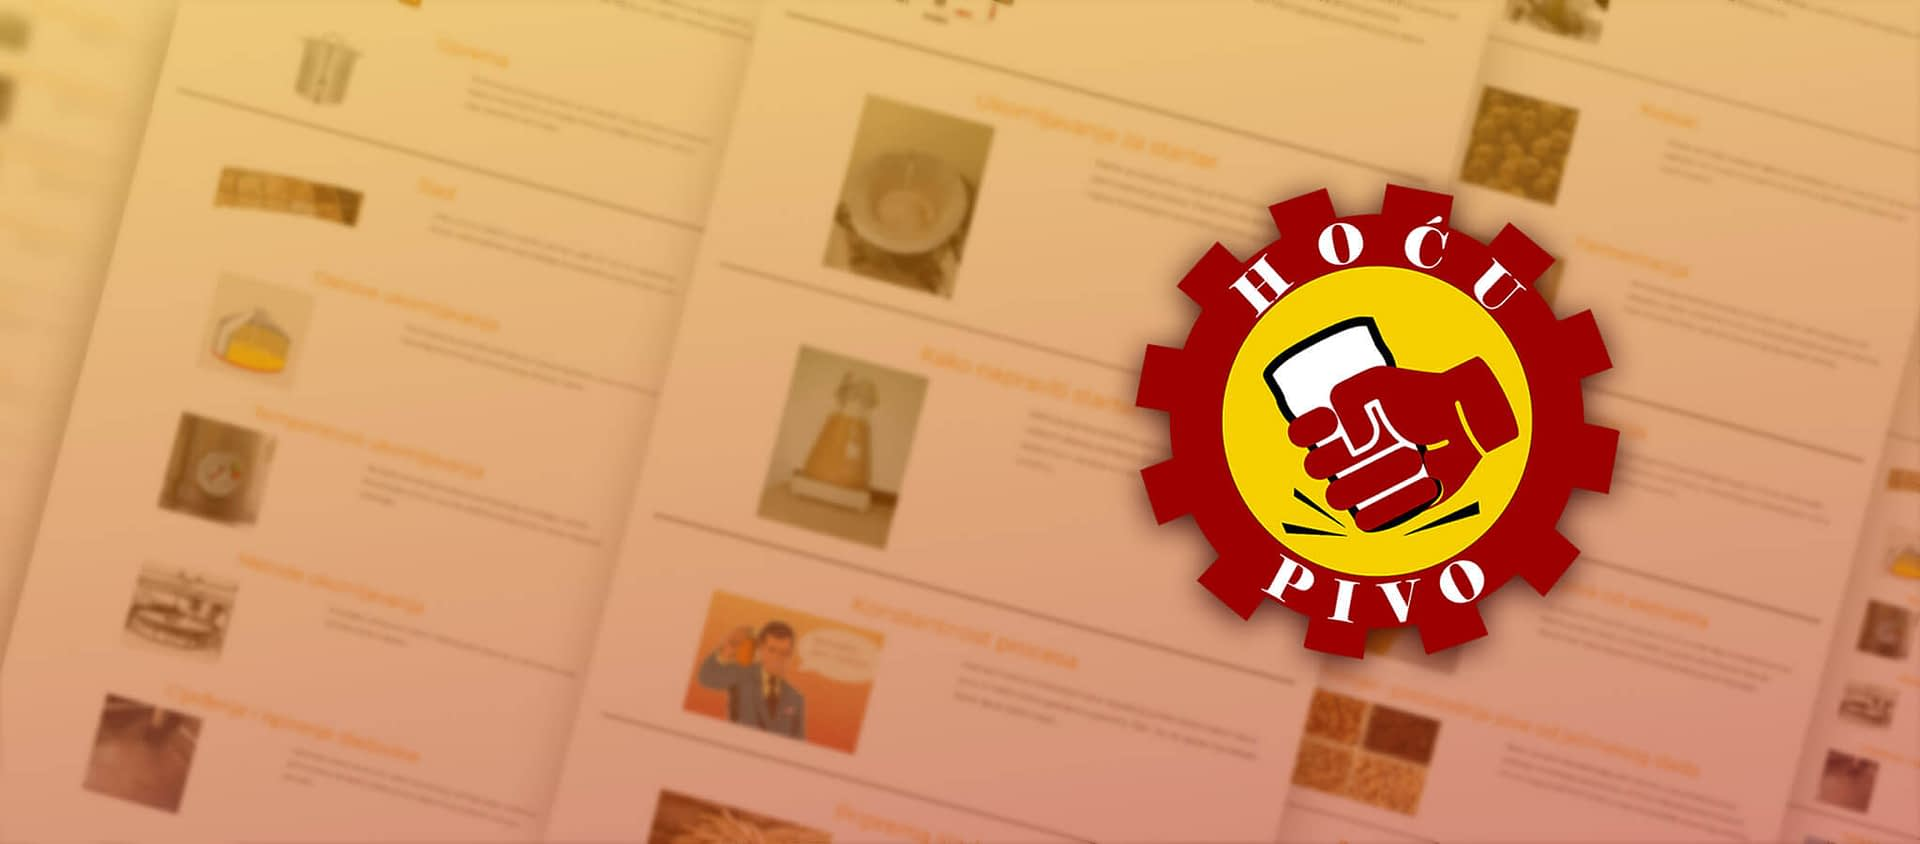 Kako je nastala online škola piva Hoću Pivo